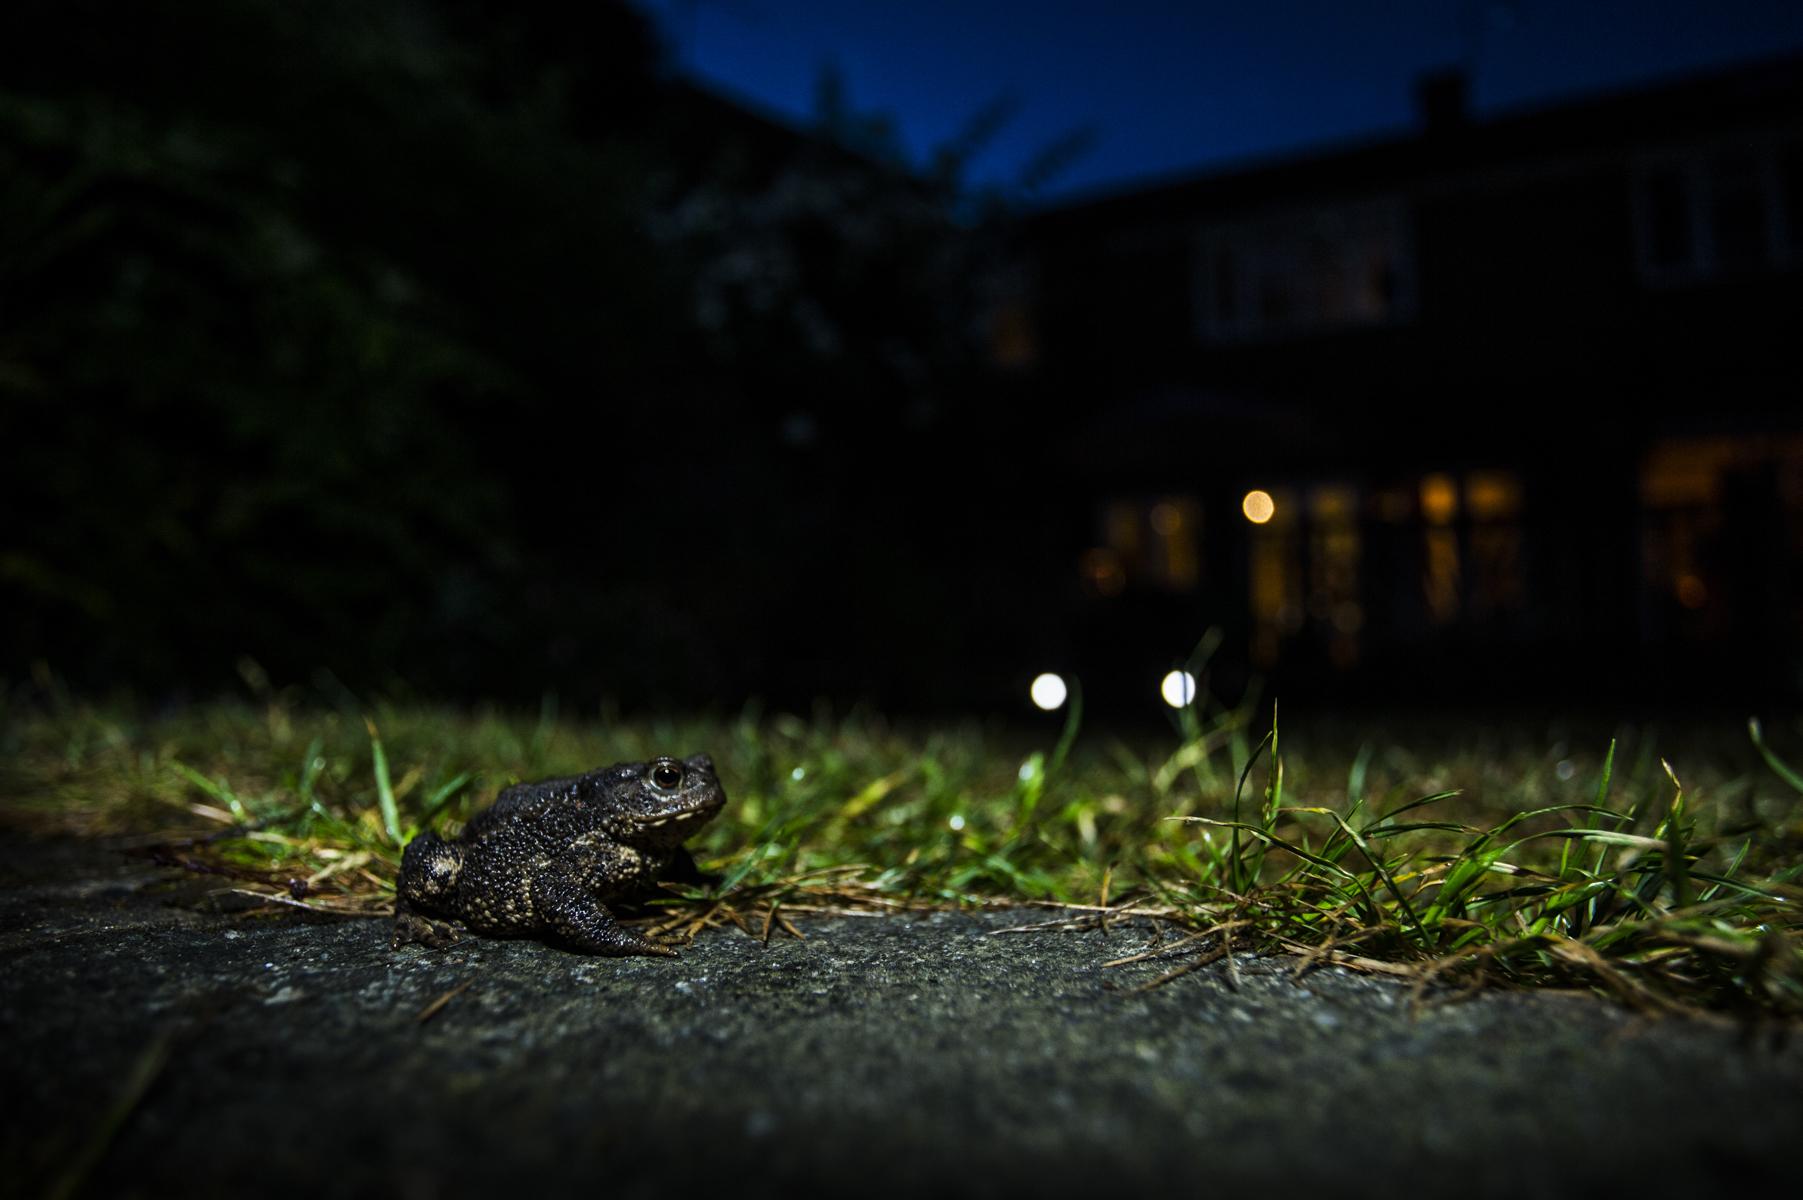 A toad in a suburban garden in Wimbledon.